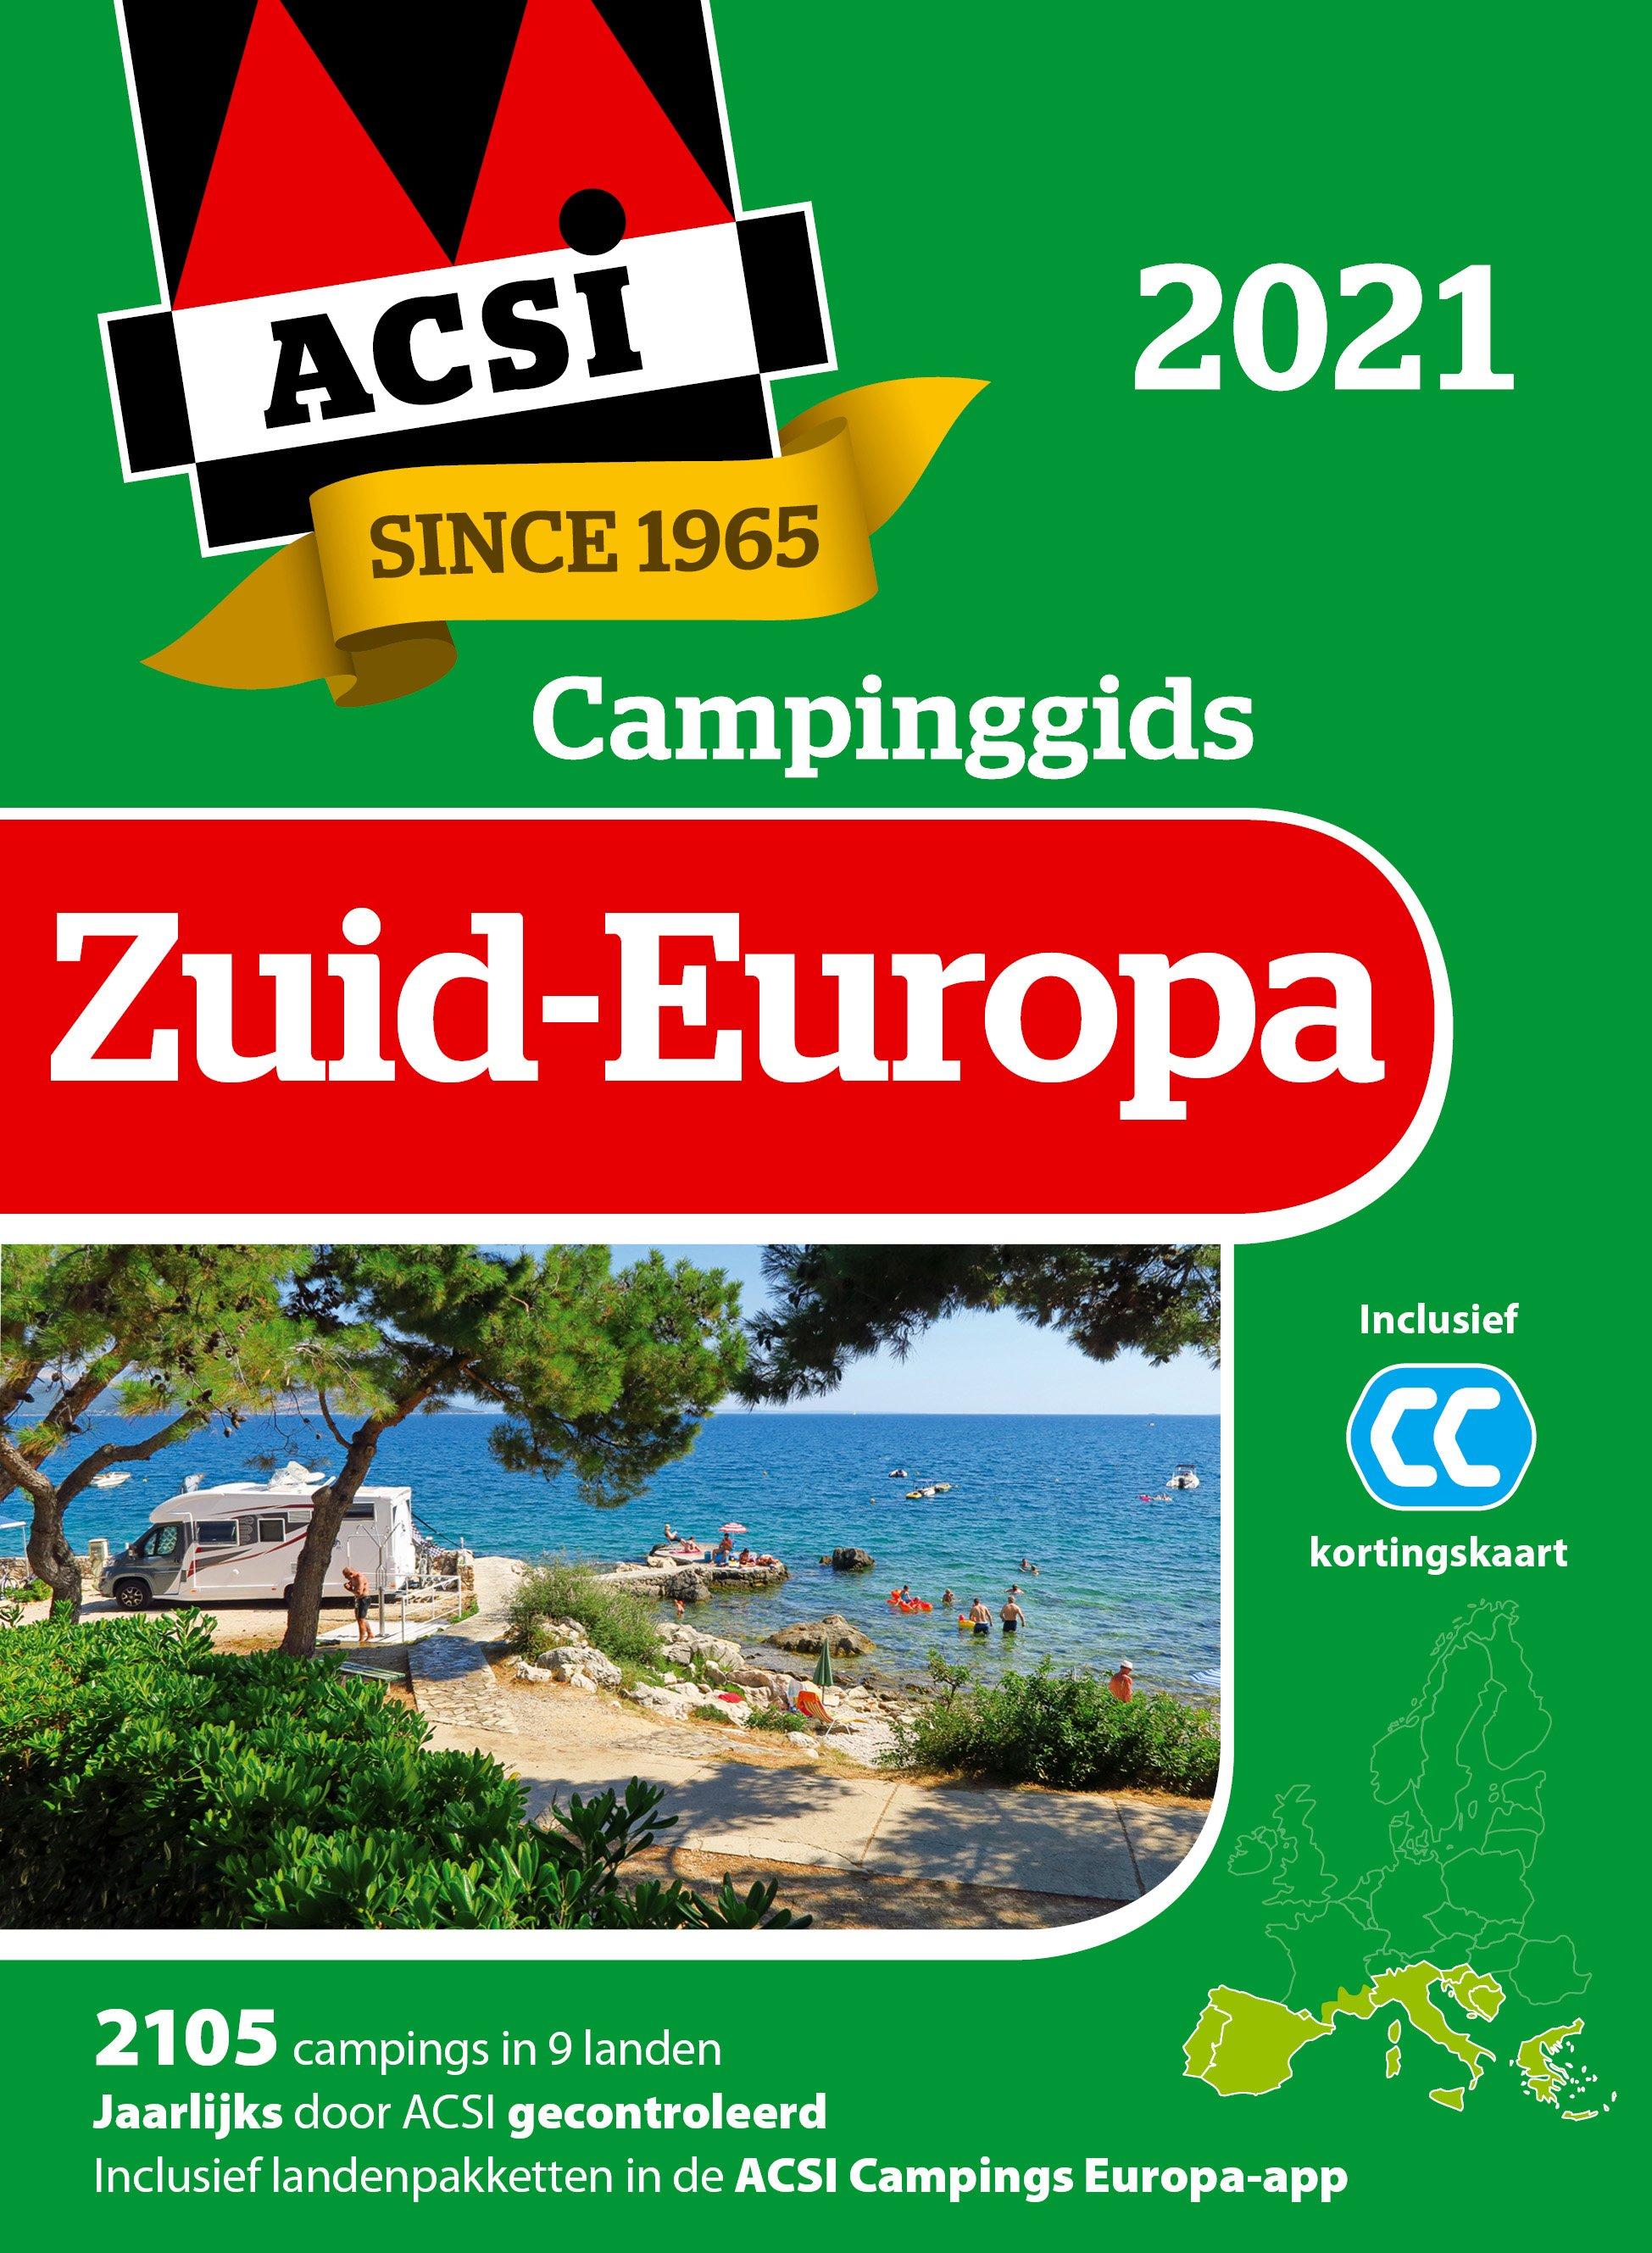 Campinggids zuid-europa 2021 + app